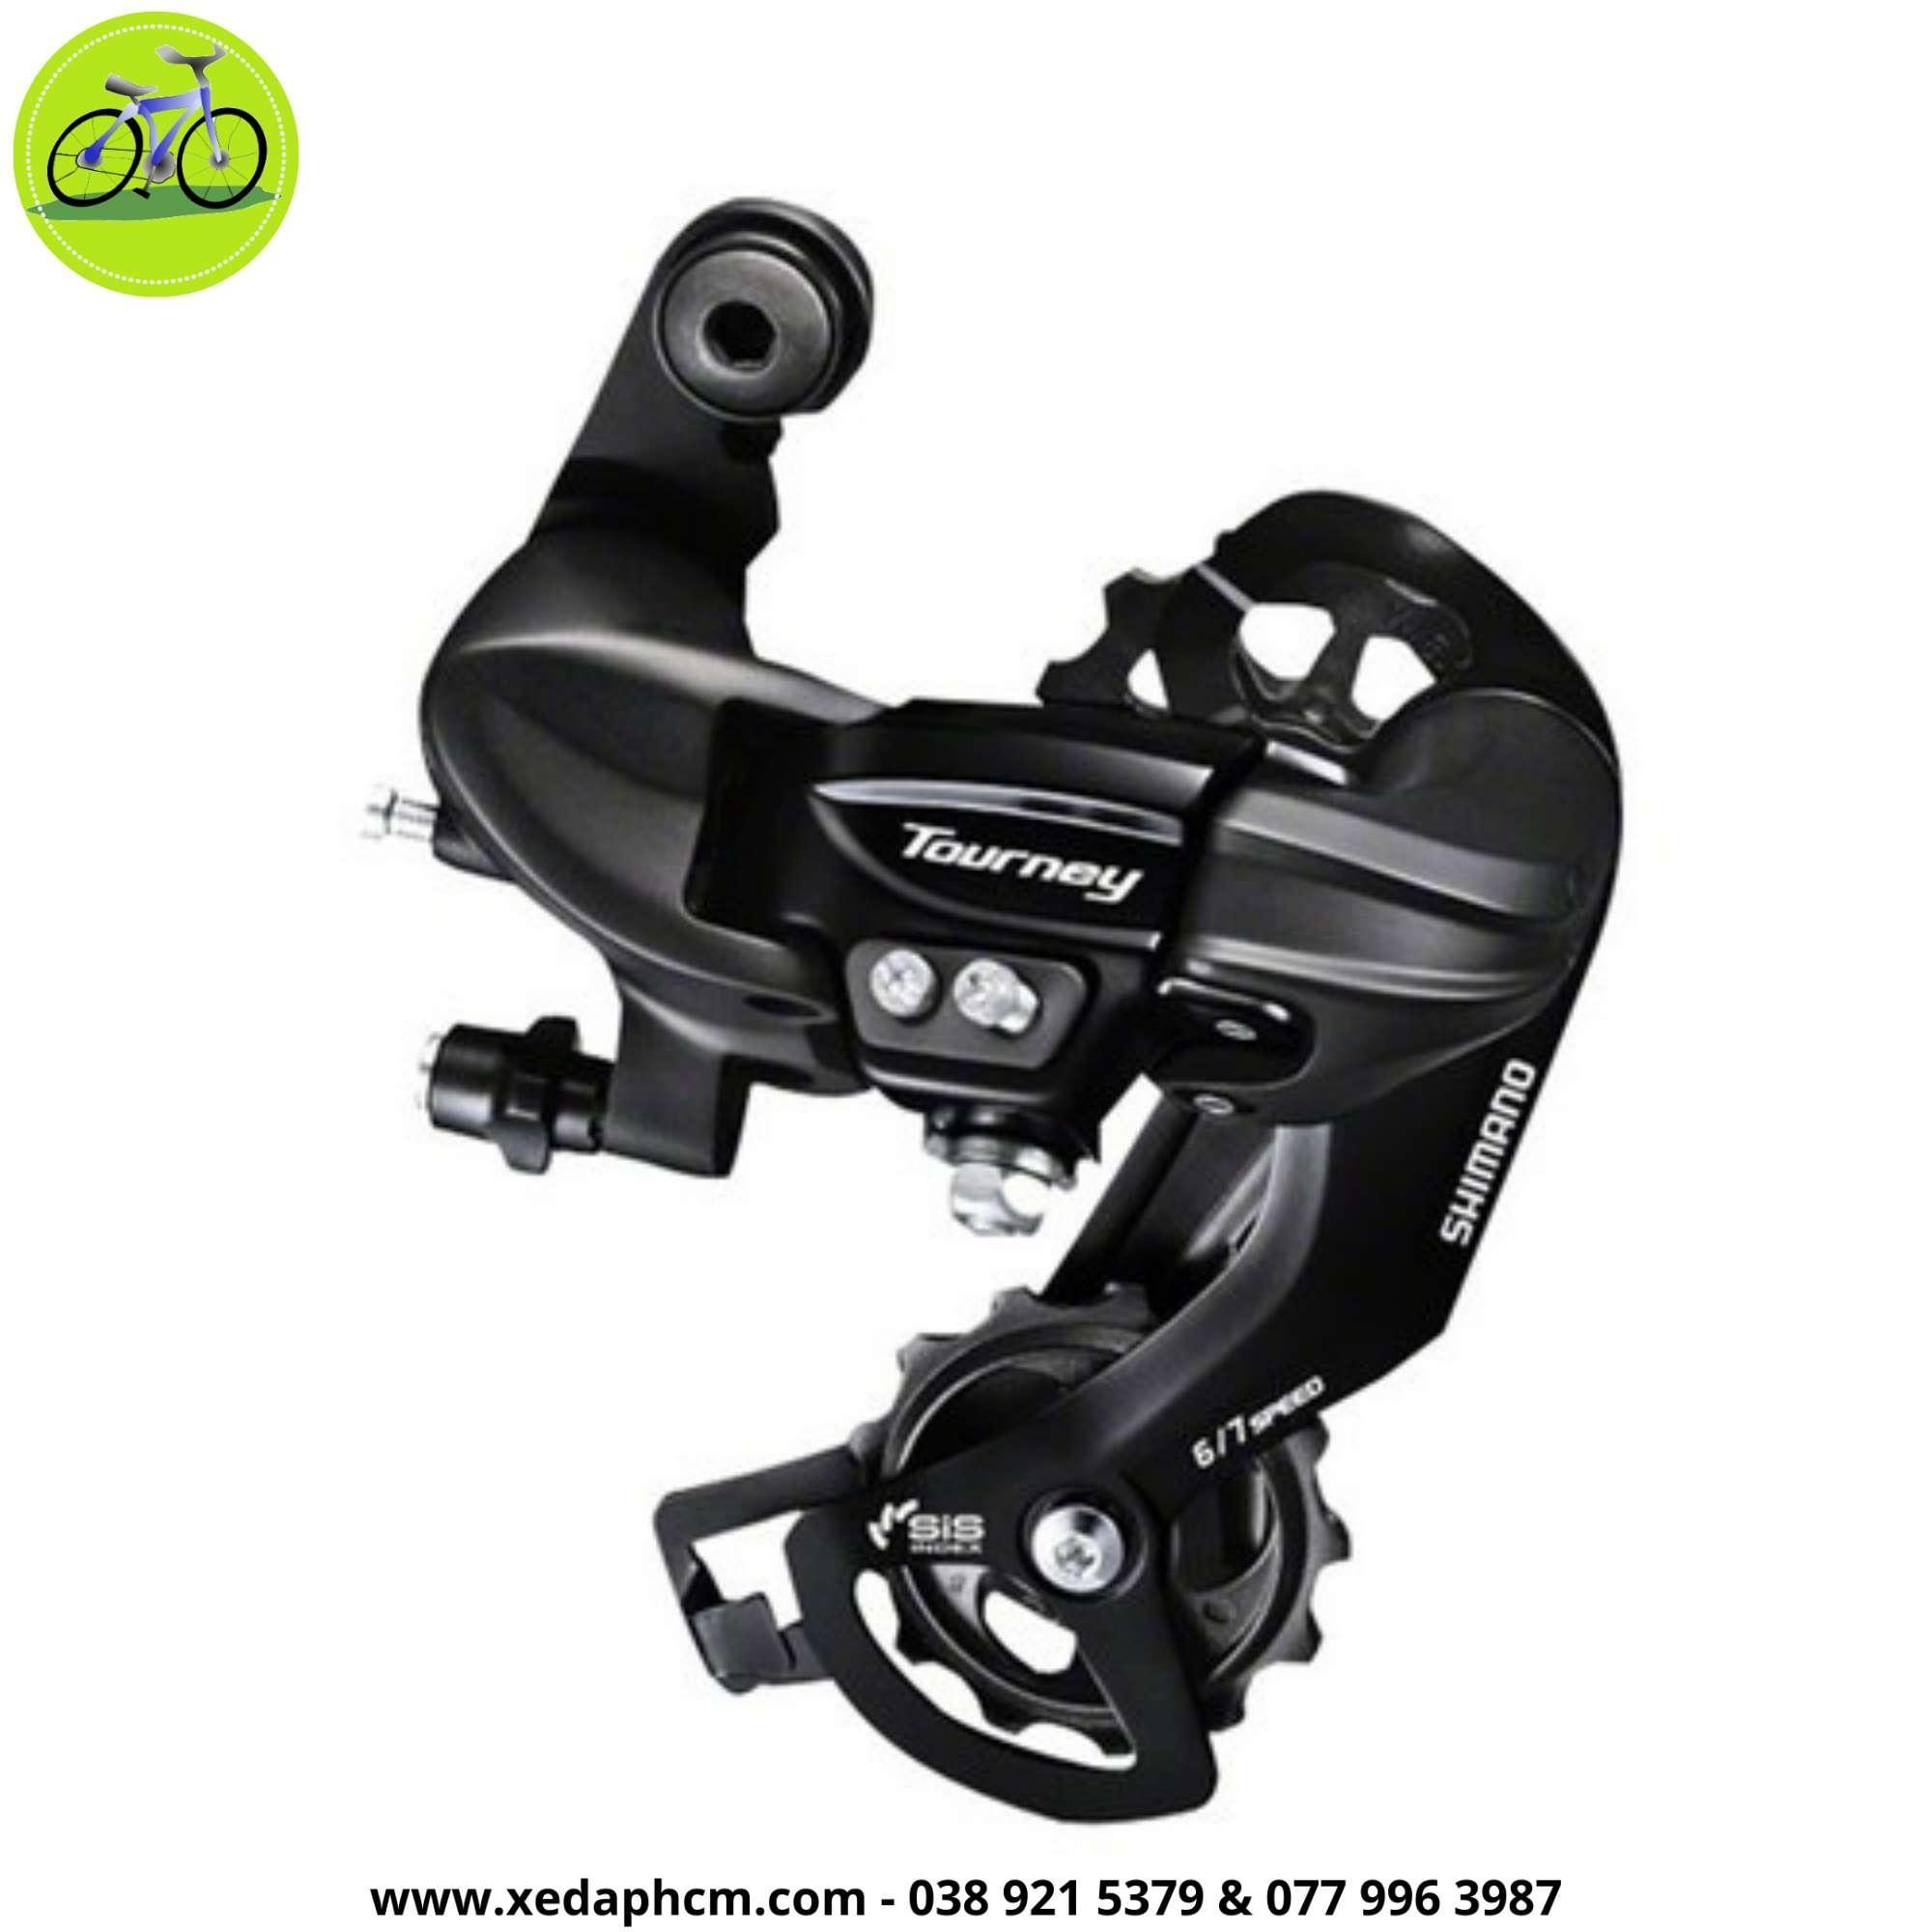 Mua Cùi đề xe đạp Shimano Tourney RD-TY300 6/7 Speed